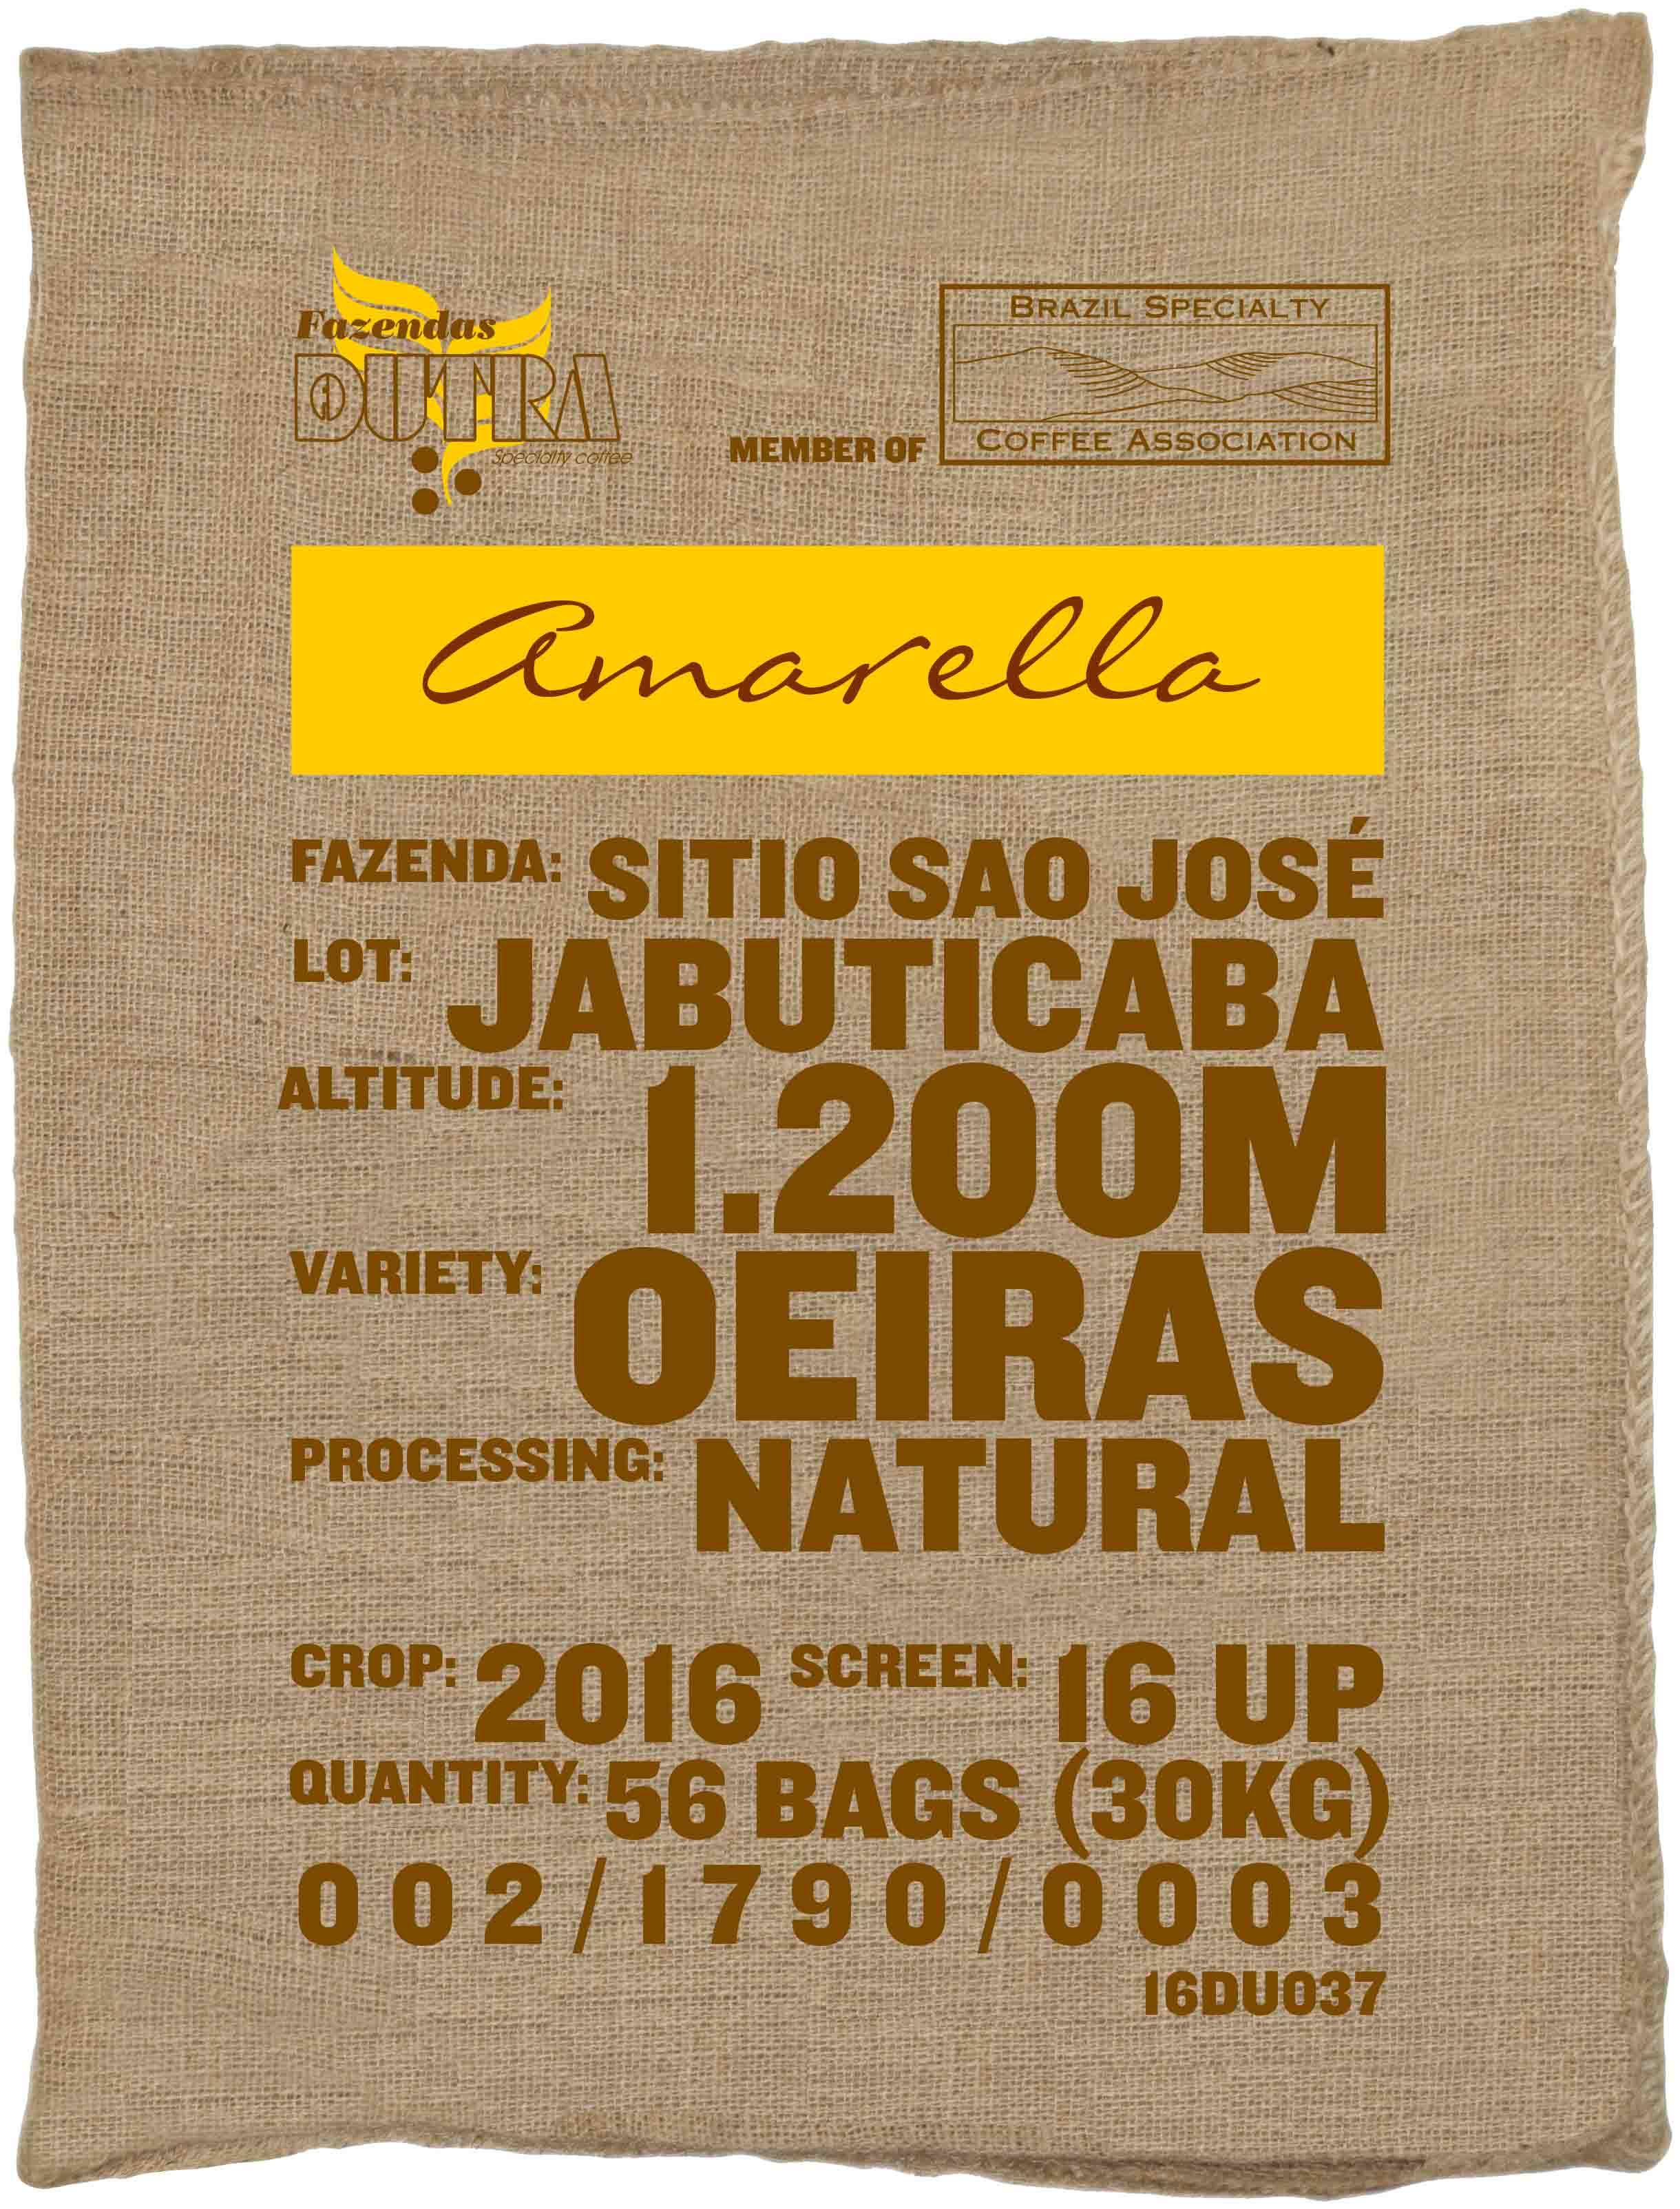 Ein Rohkaffeesack amarella Parzellenkaffee Varietät Oeiras. Fazendas Dutra Lot Jabuticaba.